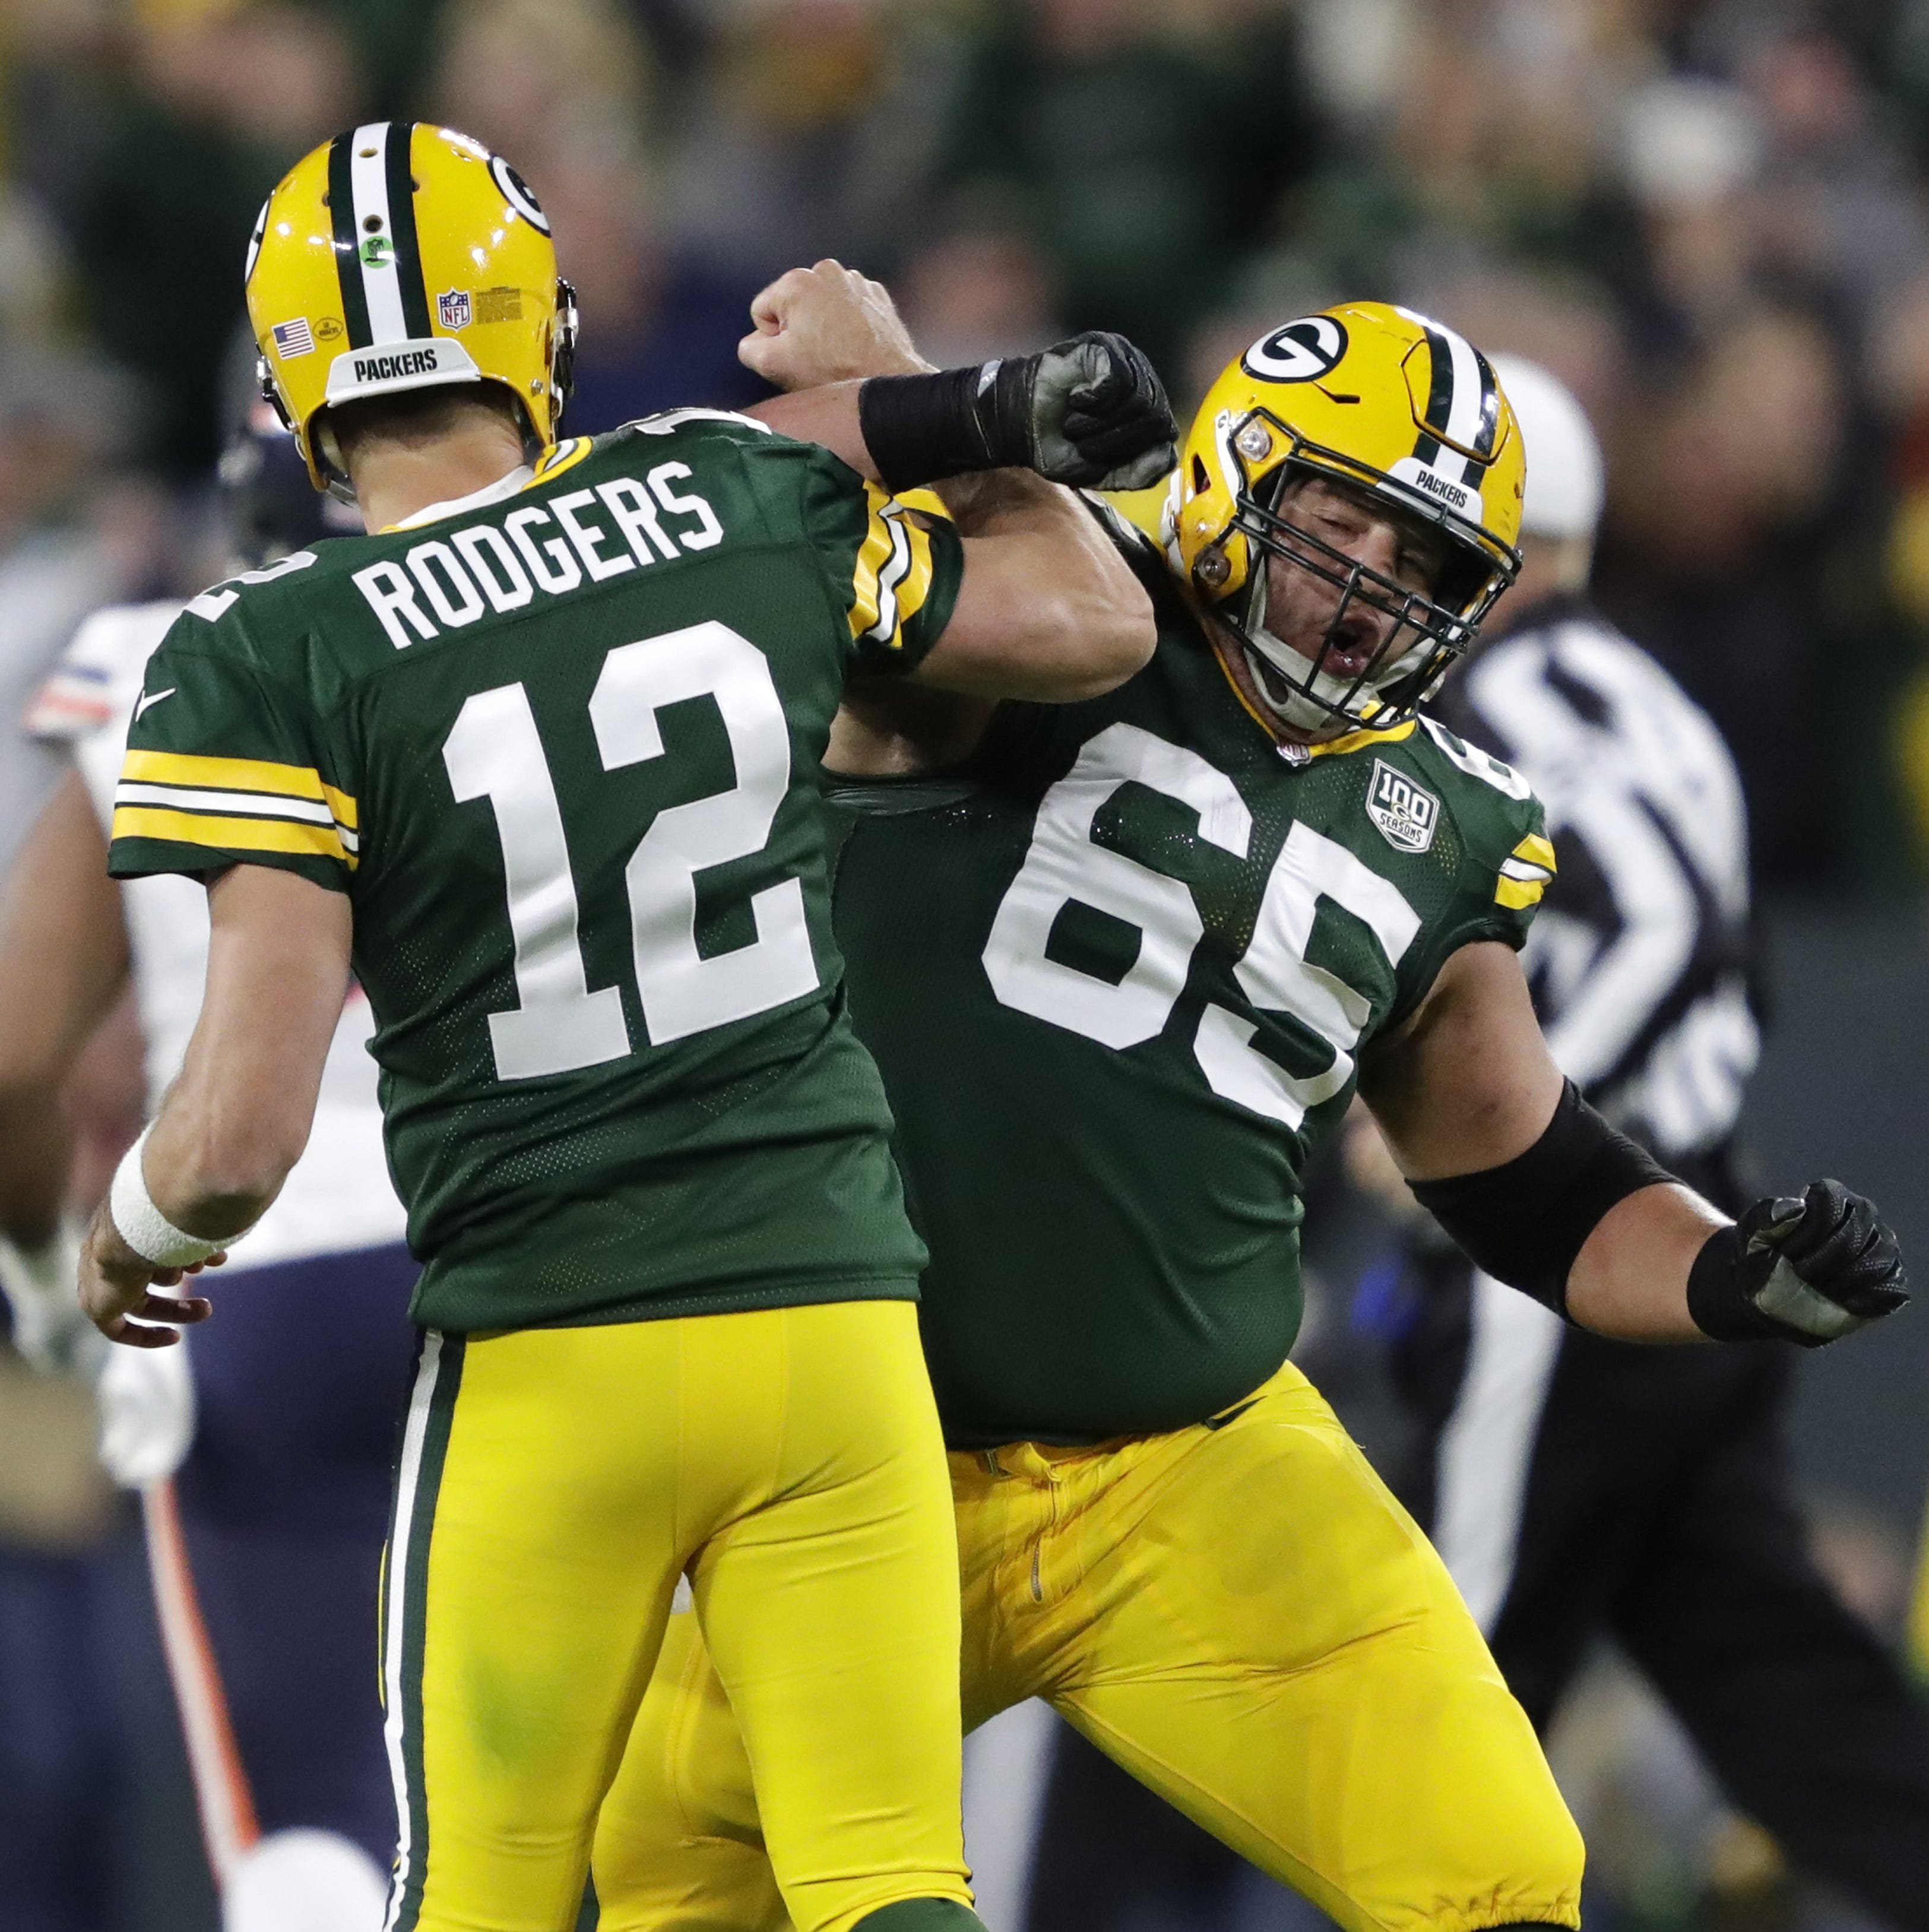 Packers notes: Makeshift line spells trouble vs. Khalil Mack, Bears' pass rush